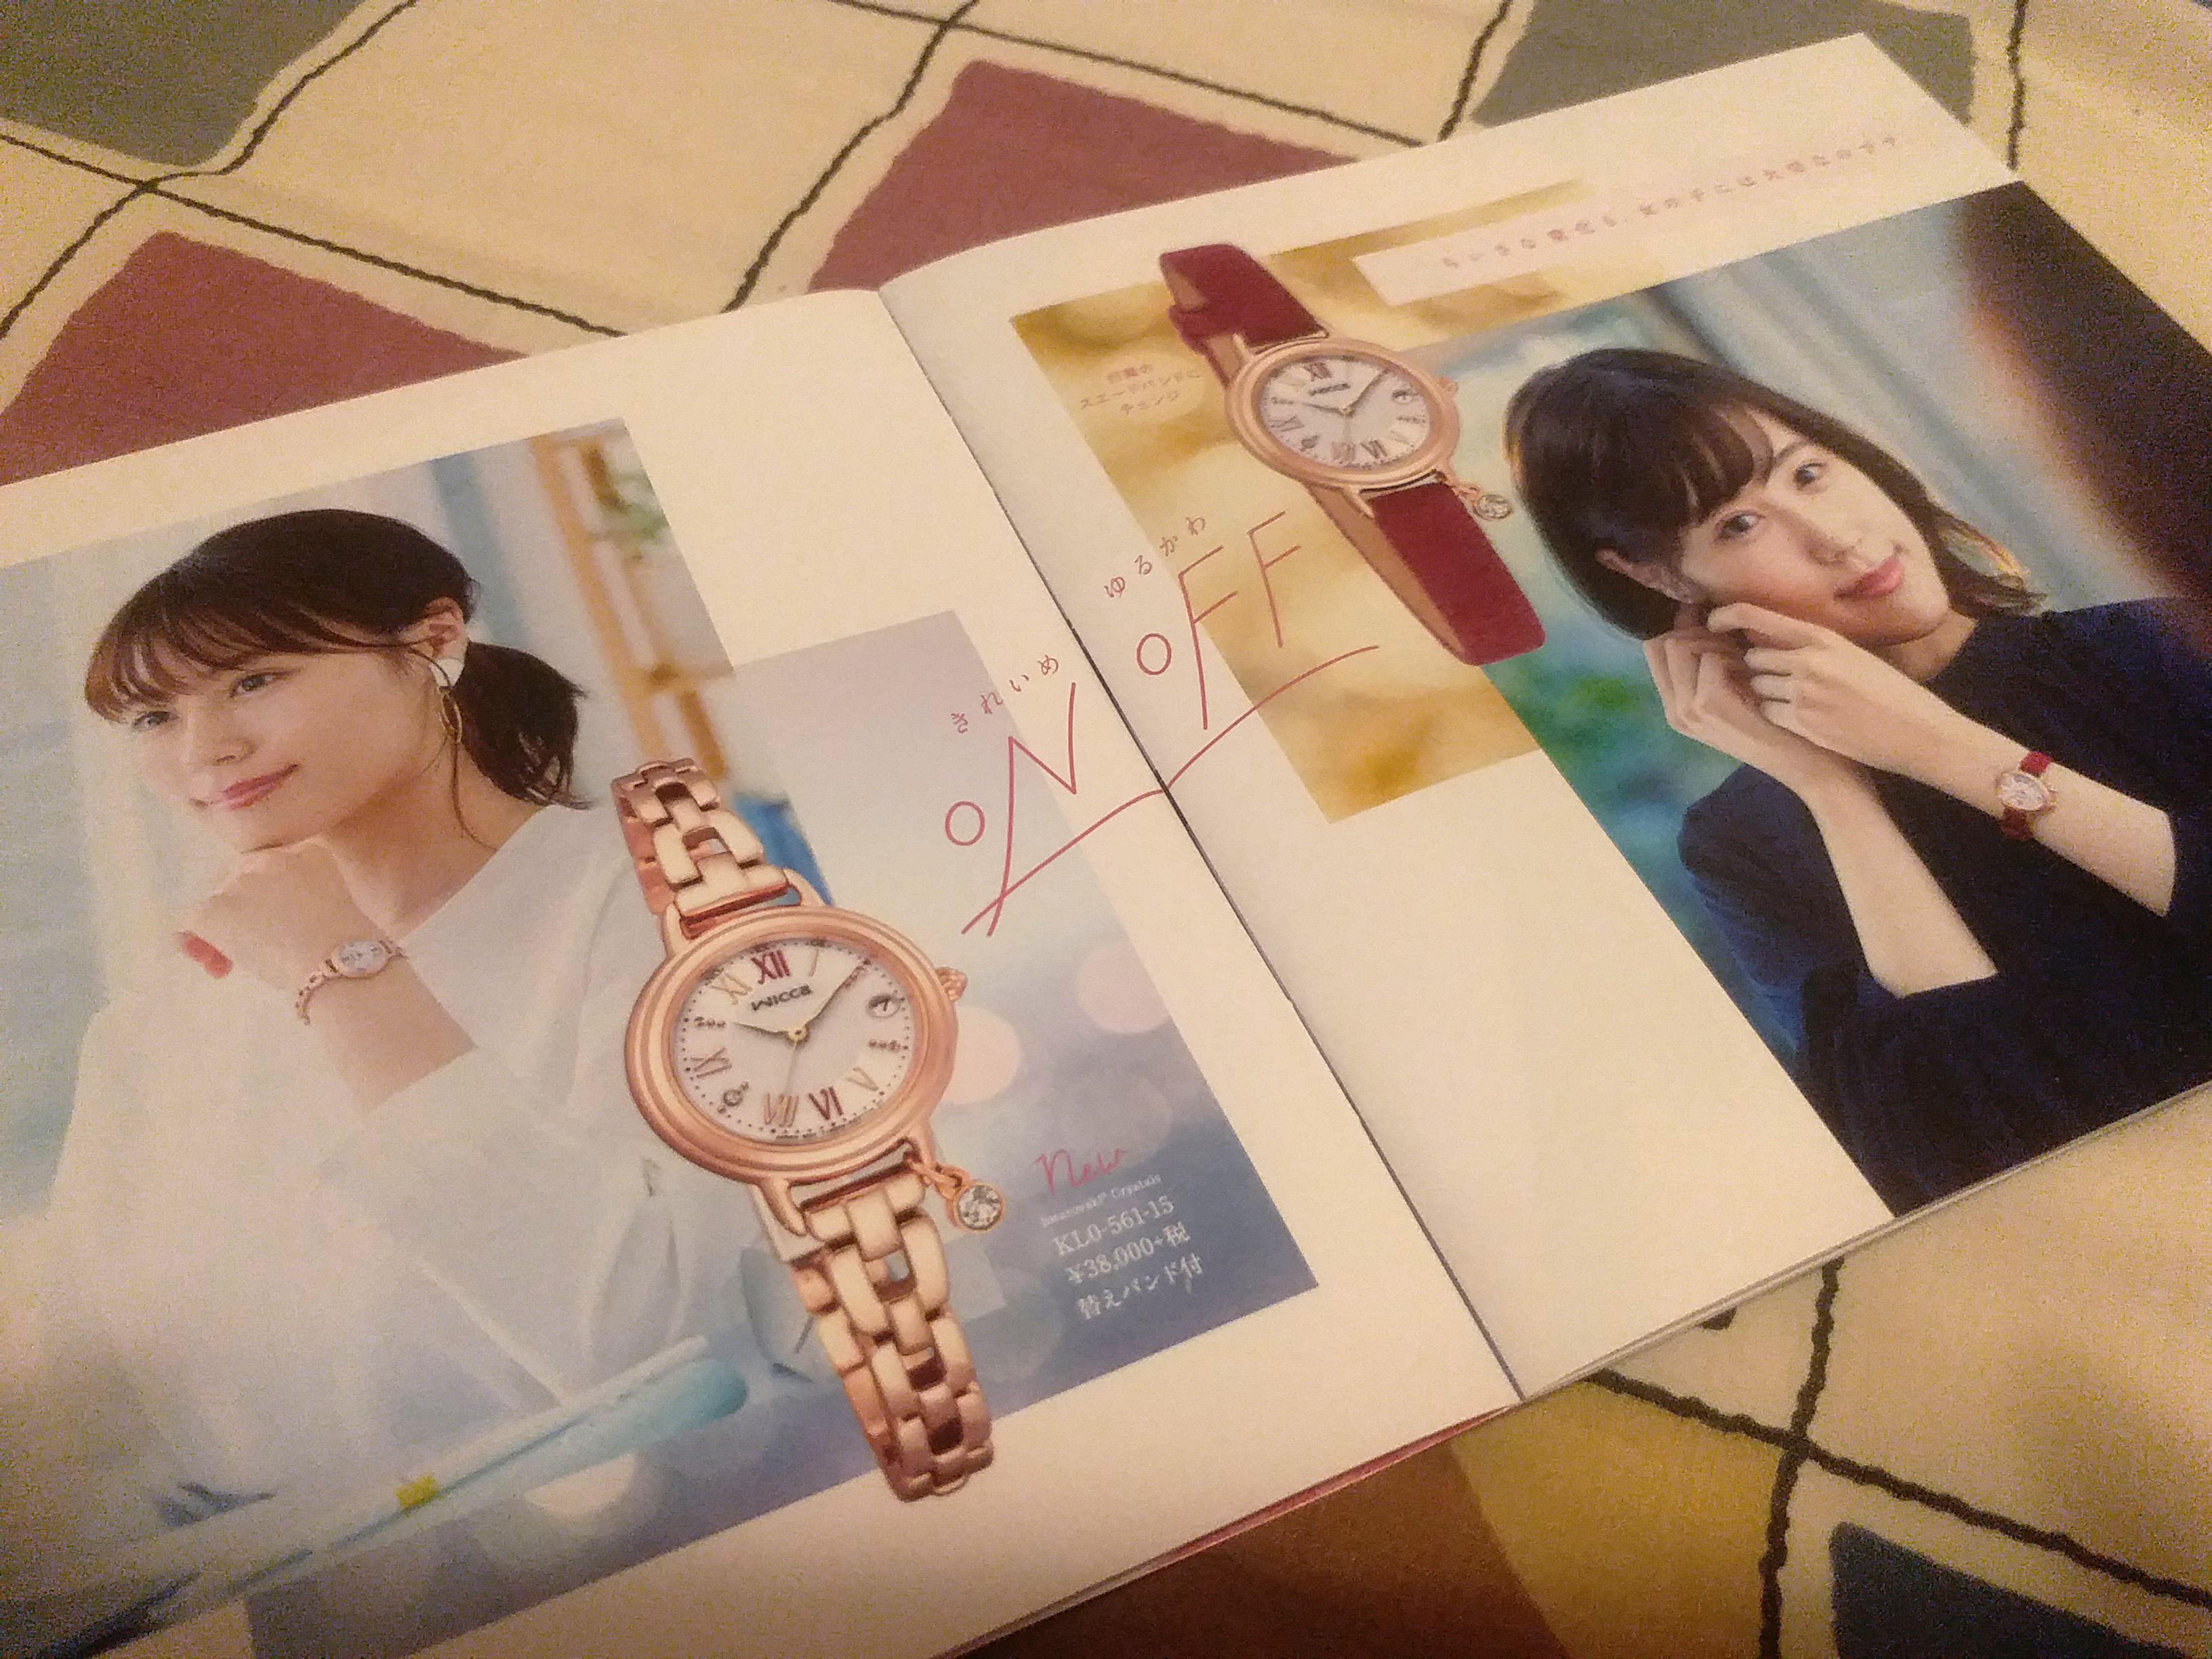 Kasumi Arimura's product caterlog